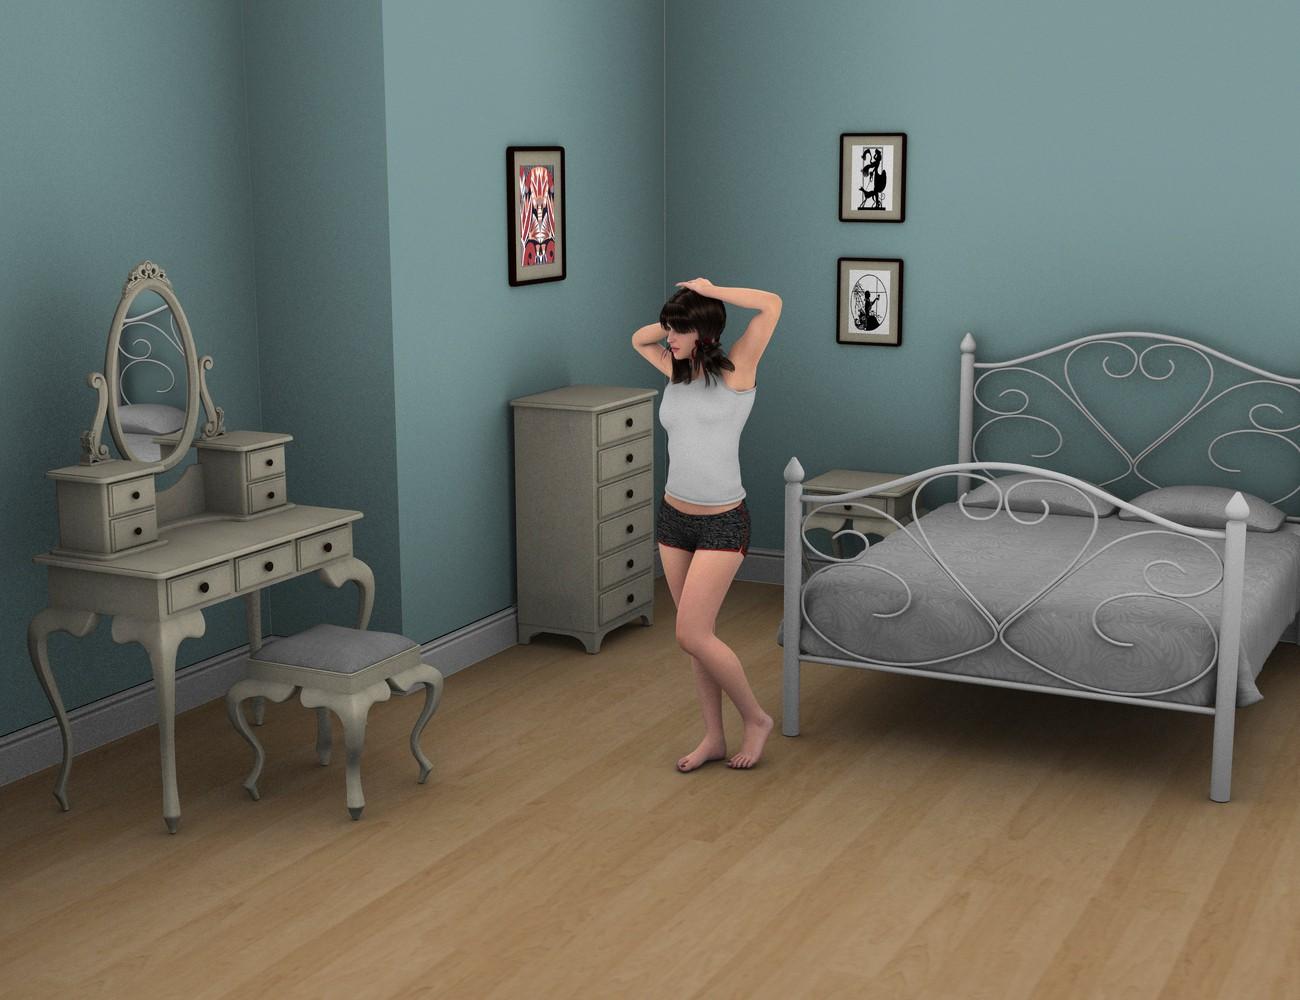 Download daz studio 3 for free daz 3d bedroom furniture - Dresser for small room ...